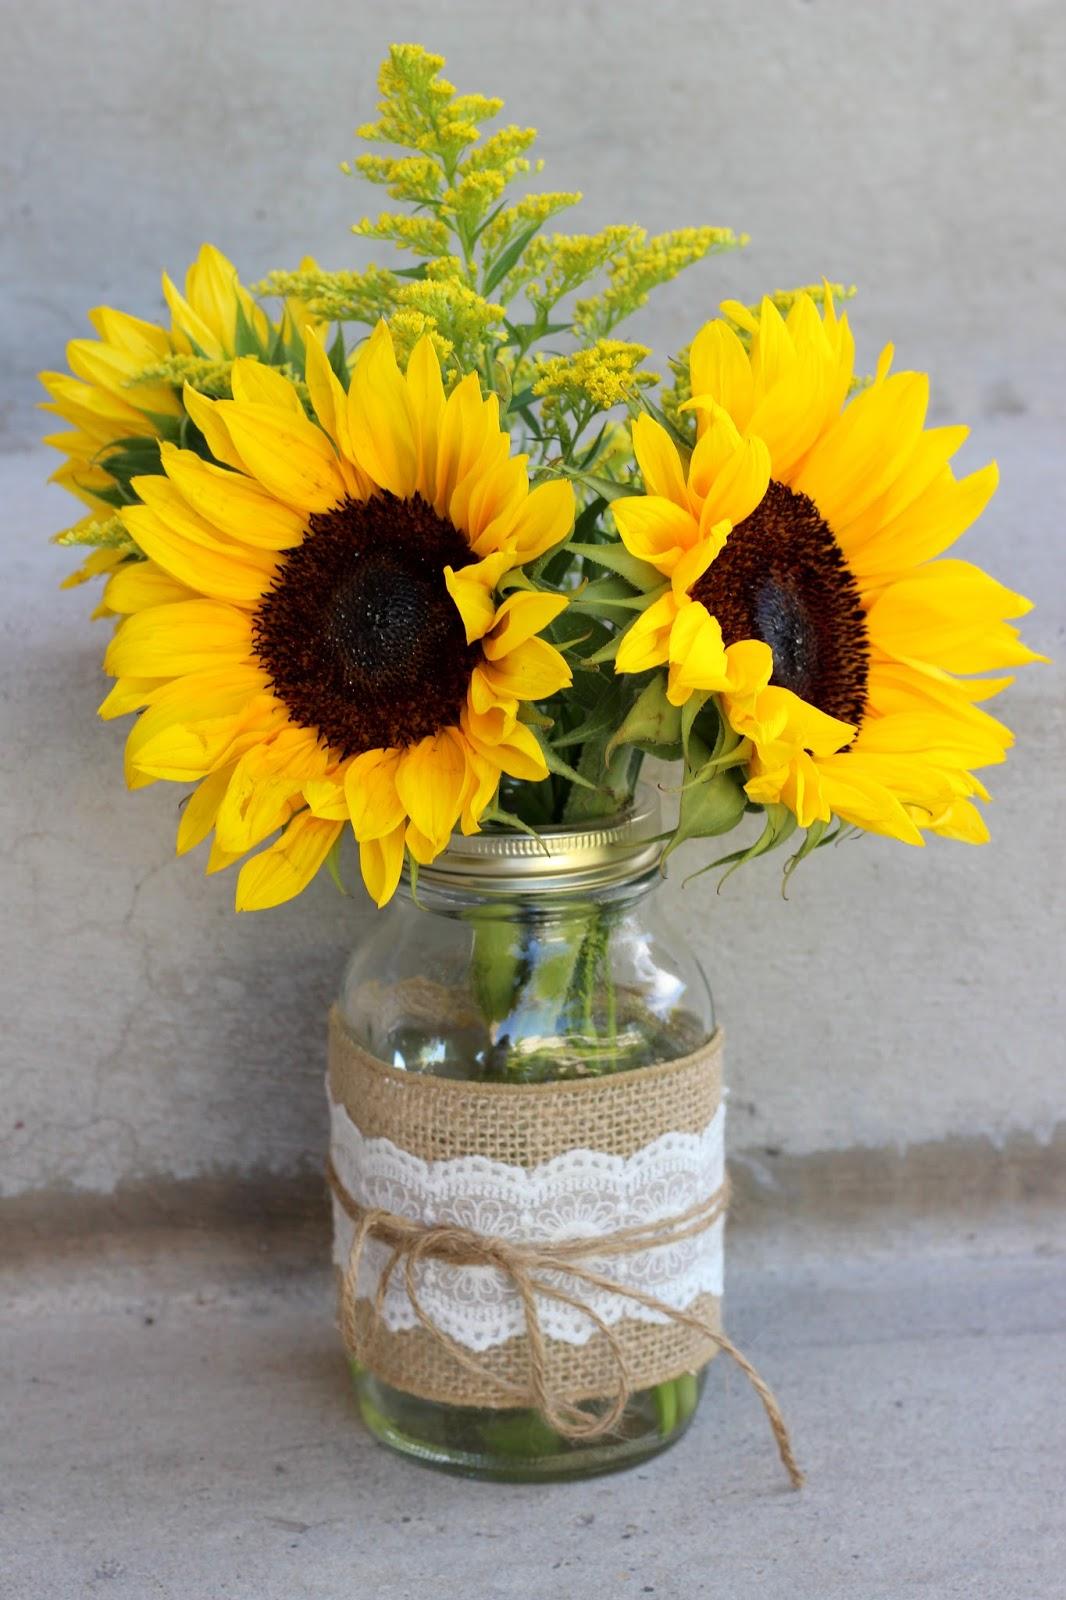 Celebration Flair: Summery Sunflowers Michelle + James